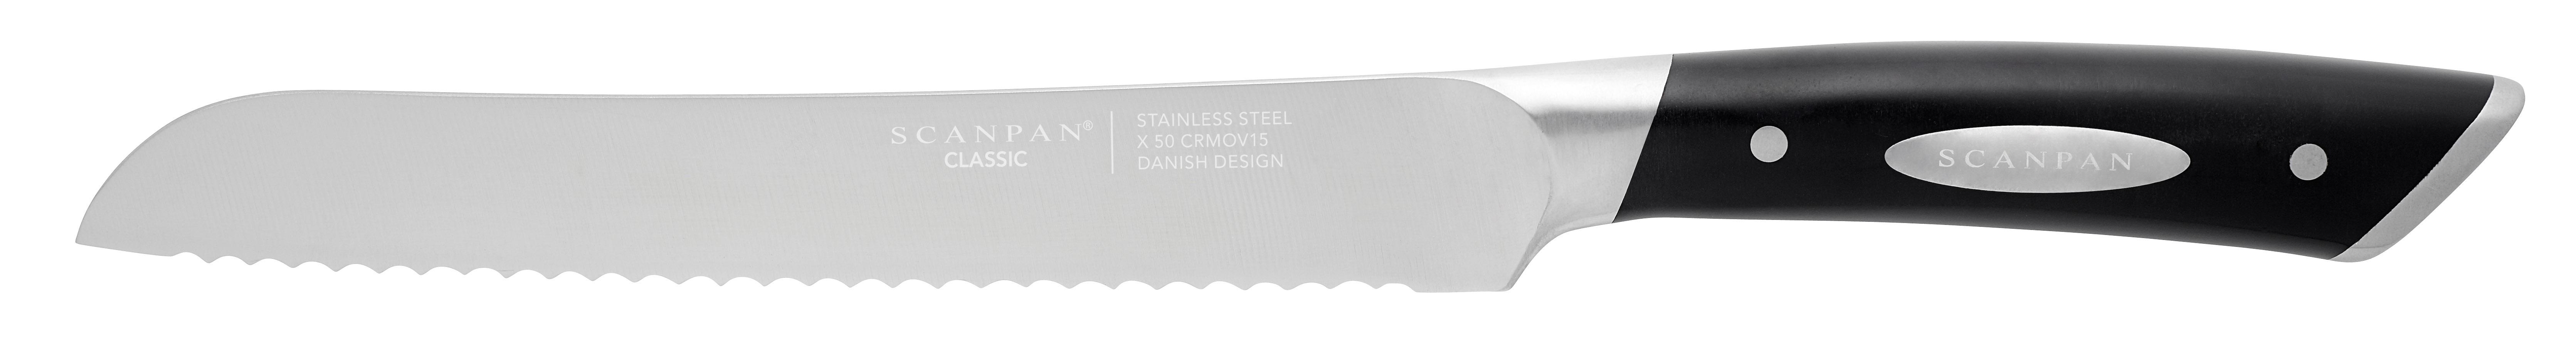 20cmbrødkniv-Classic, 20 cm